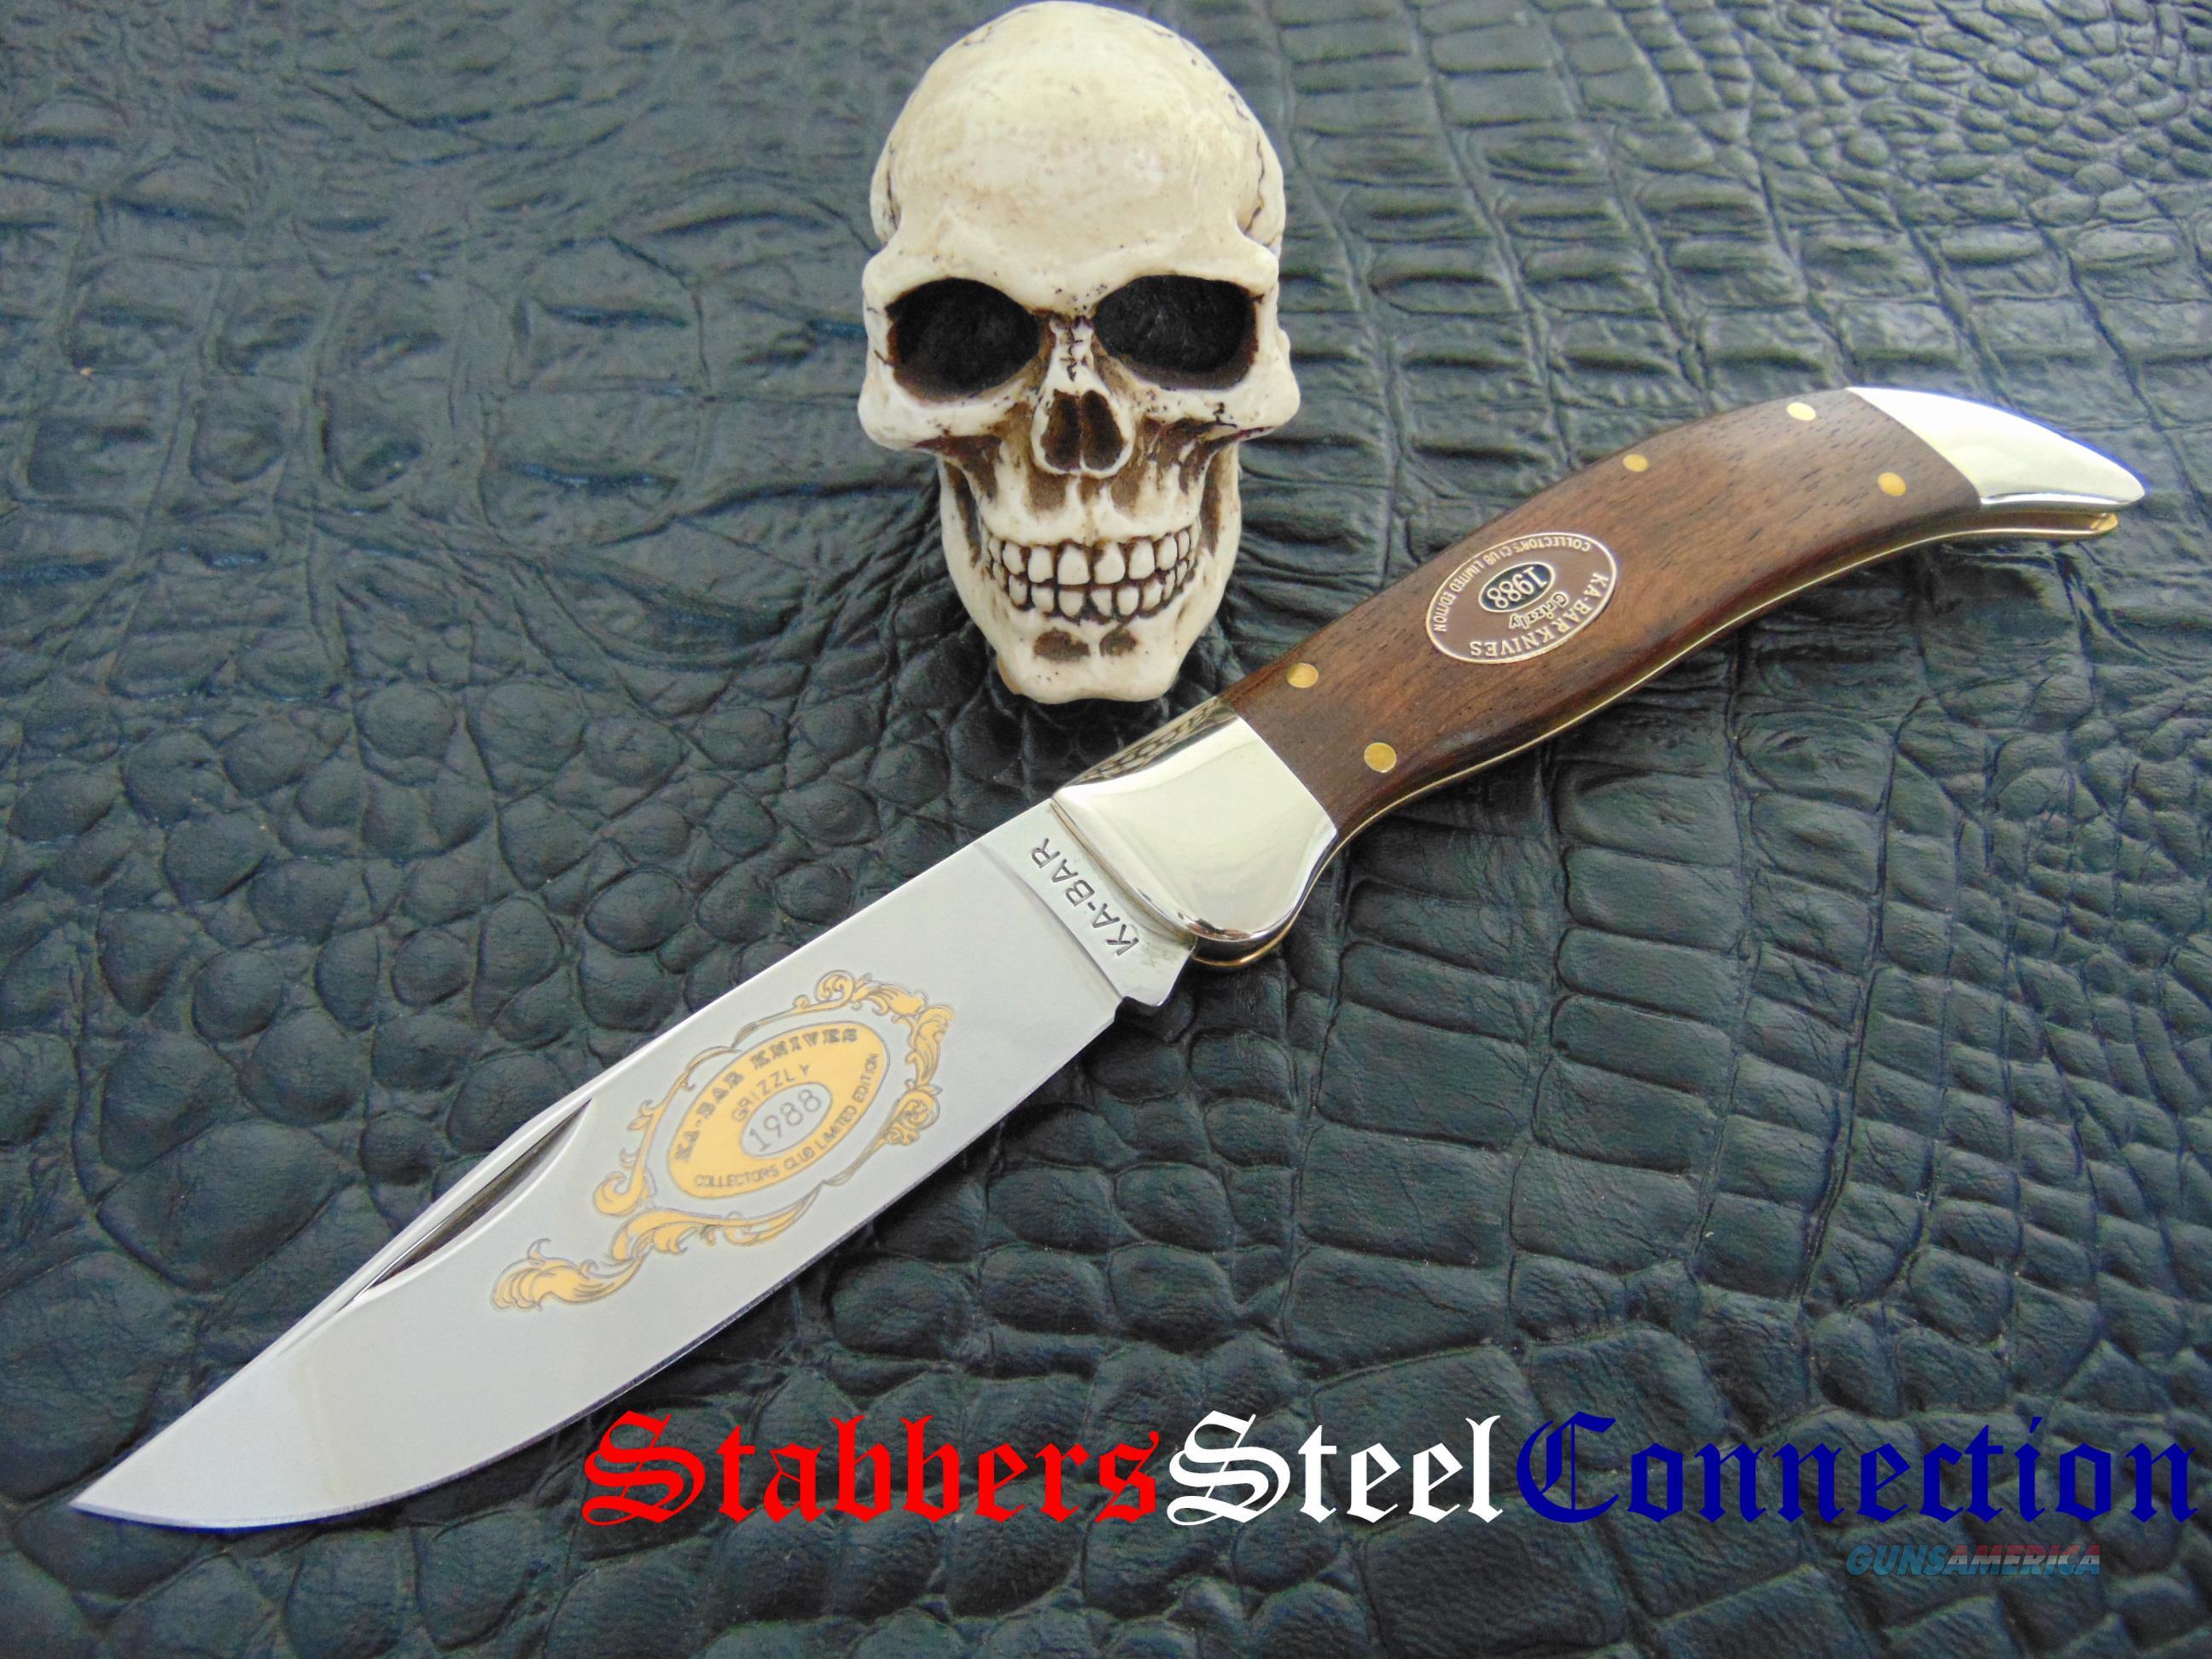 KA-Bar Grizzly LTD 1988 Collectors Club knives Made 1988  Non-Guns > Knives/Swords > Knives > Folding Blade > Hand Made